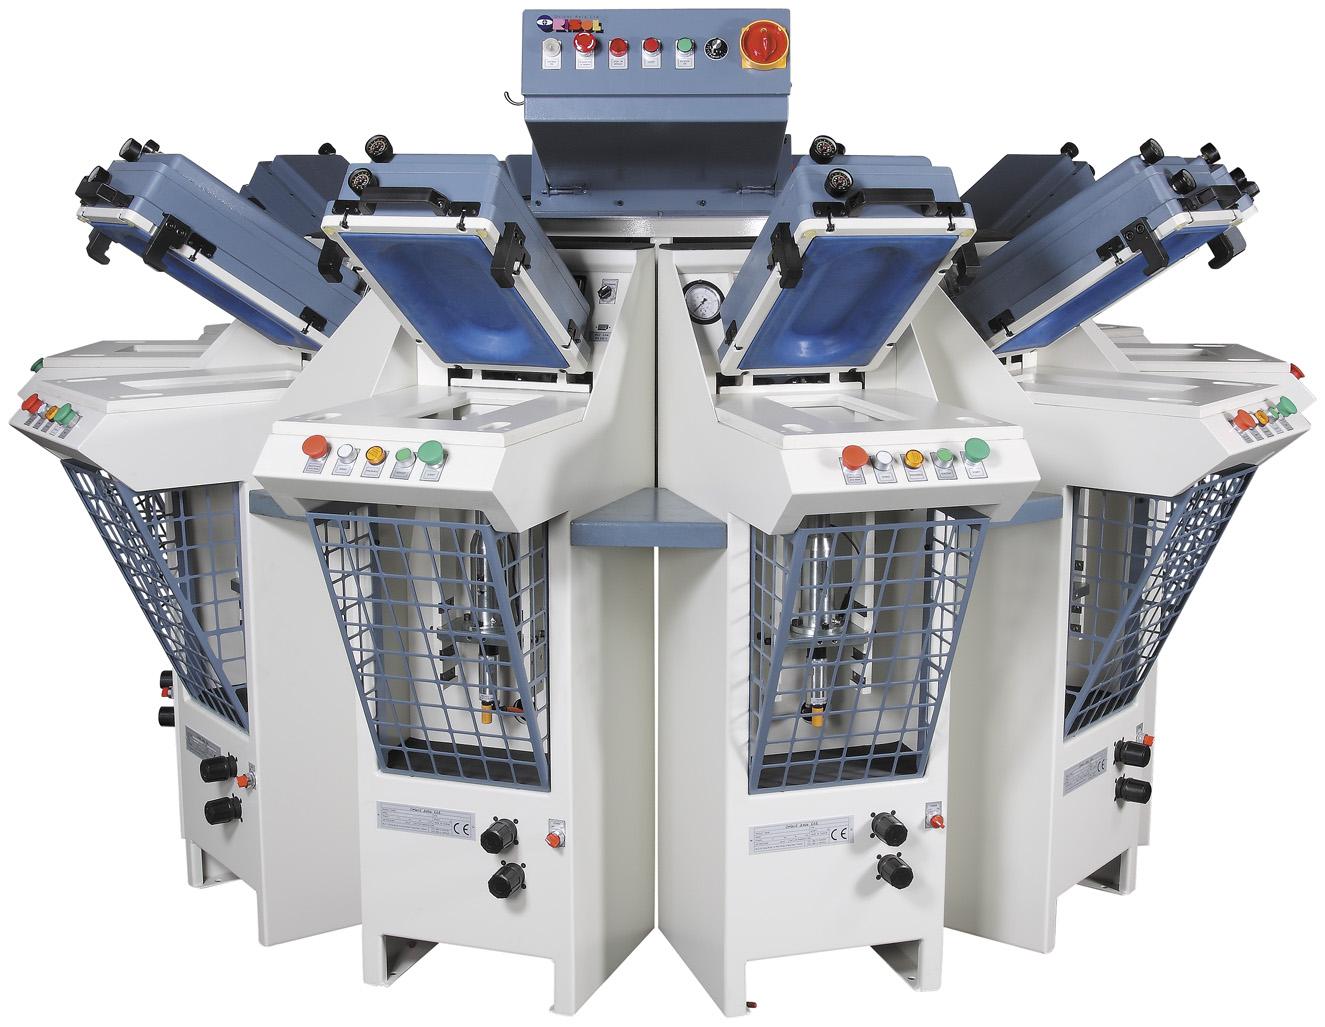 OSP-10E     Heavy duty pneumatic revolving sole press machine-10 stations